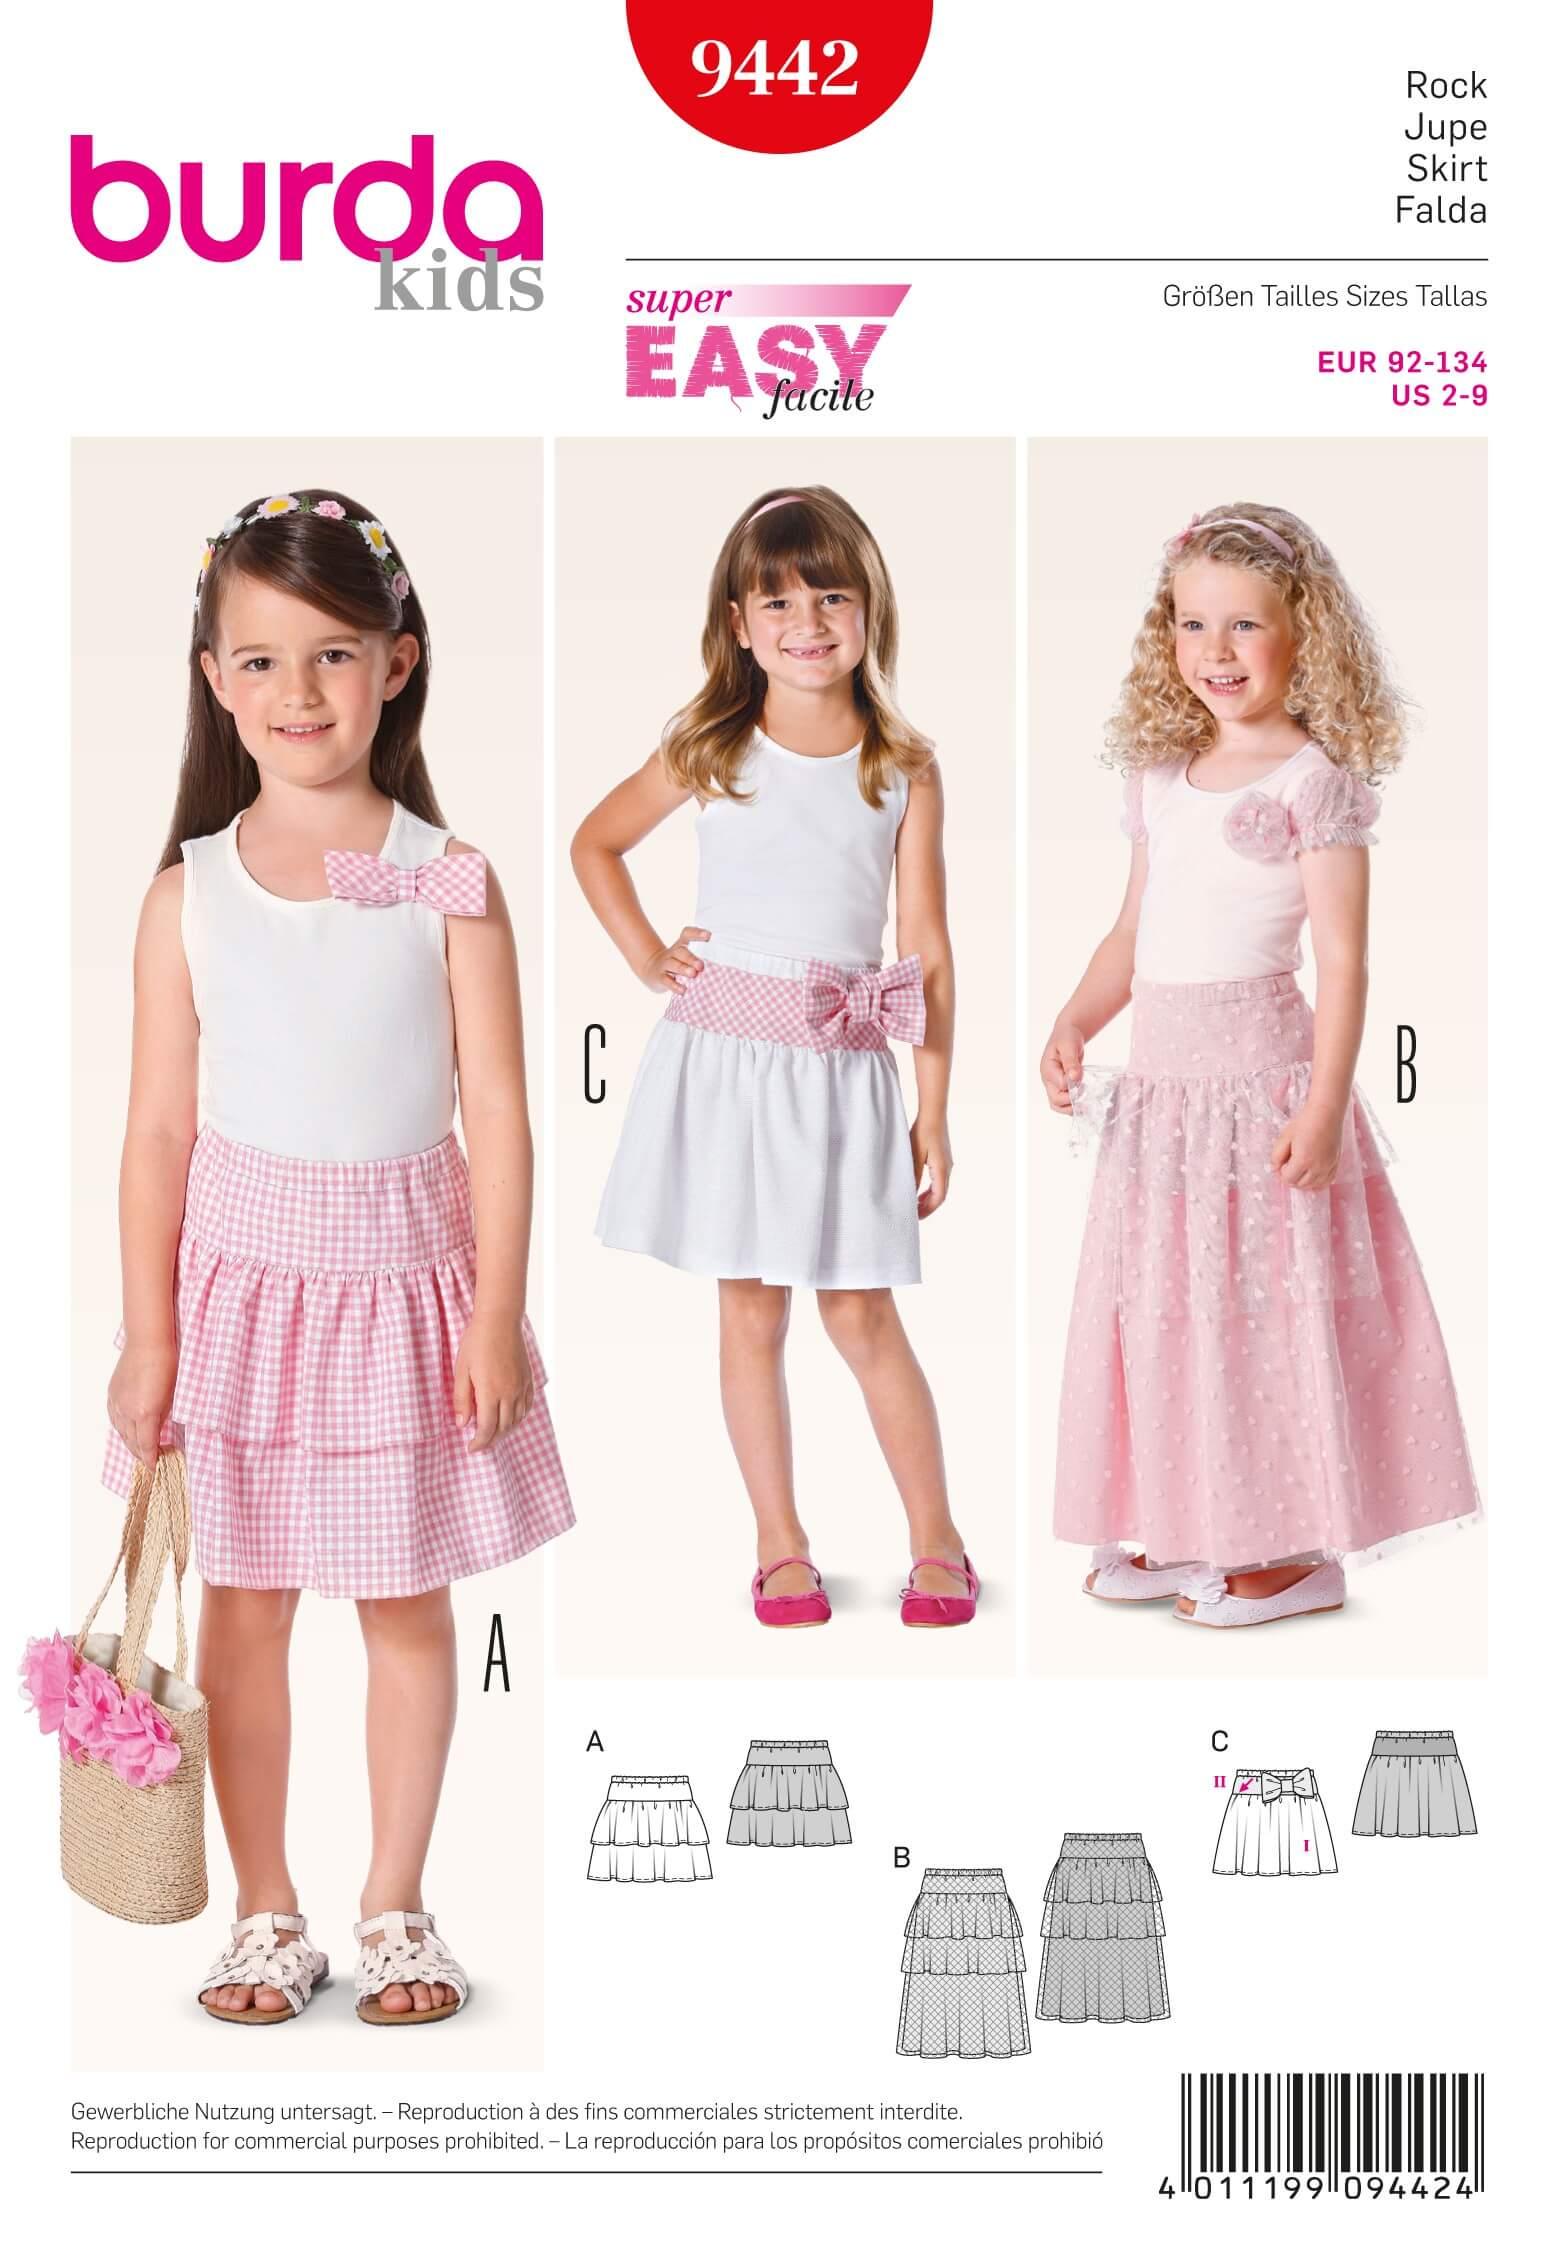 Burda Kids Girls Gypsy Skirts Tulle Fabric Sewing Pattern 9442